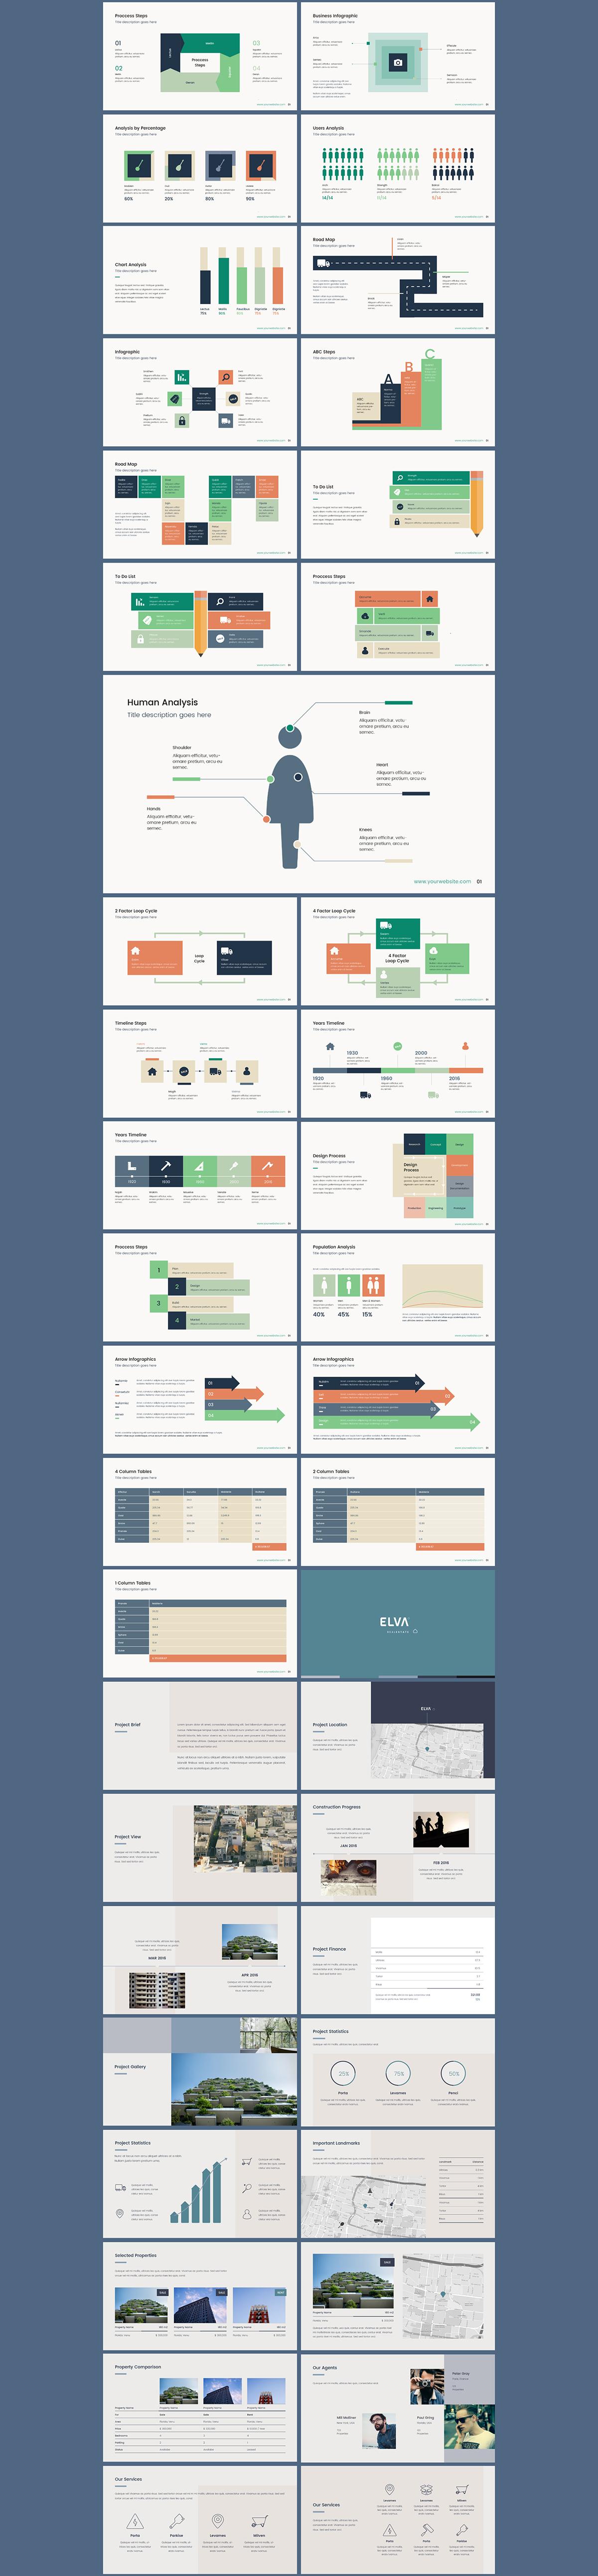 ultimate powerpoint presentation template elva on pantone canvas